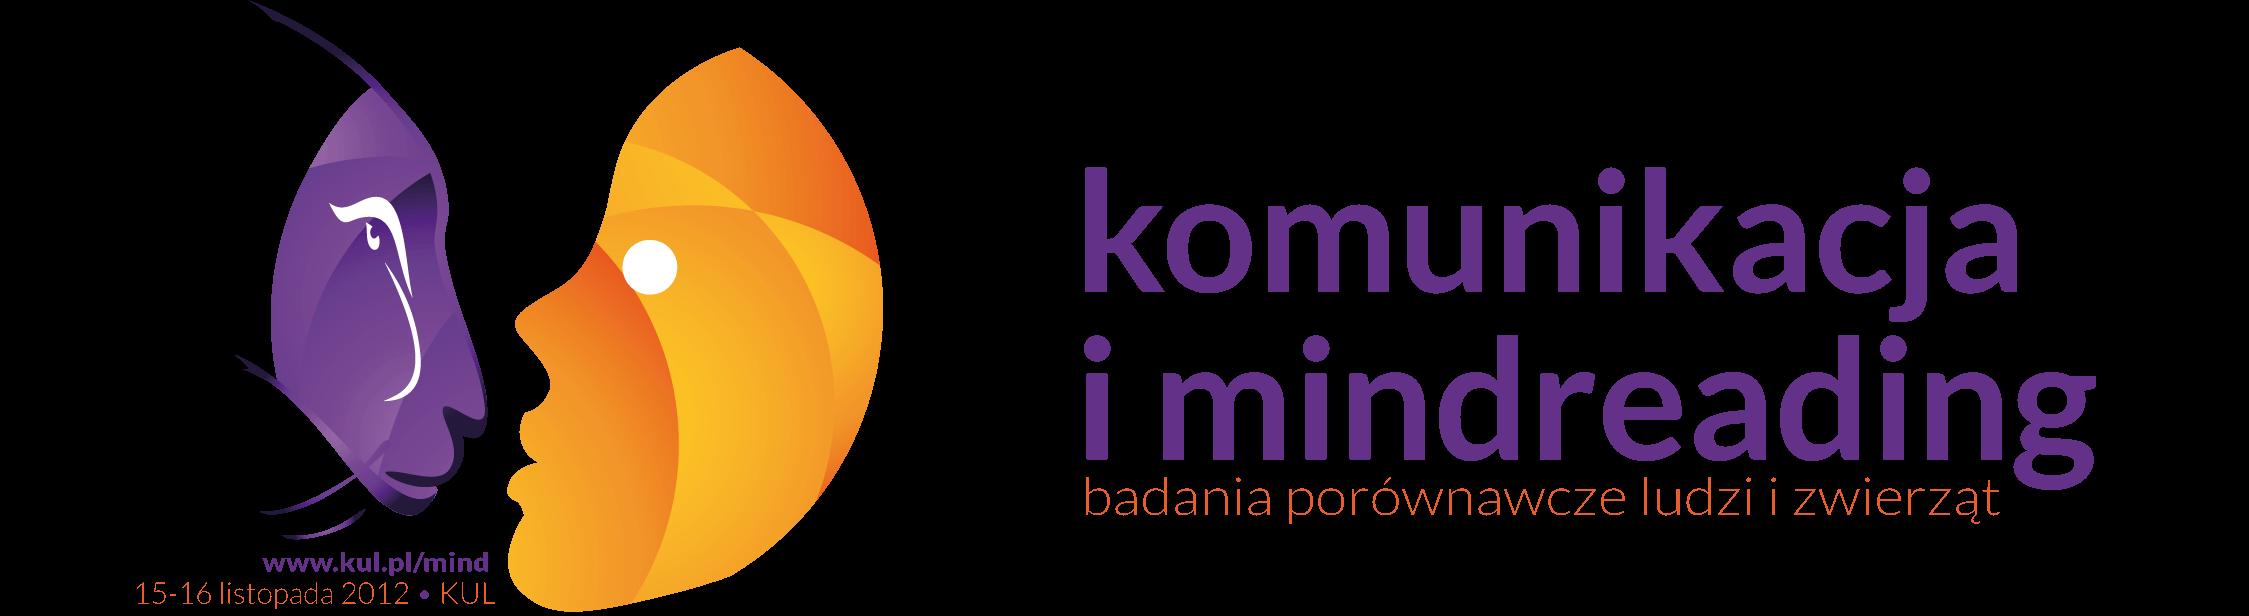 Komunikacja i mindreading www.kul.pl/mind